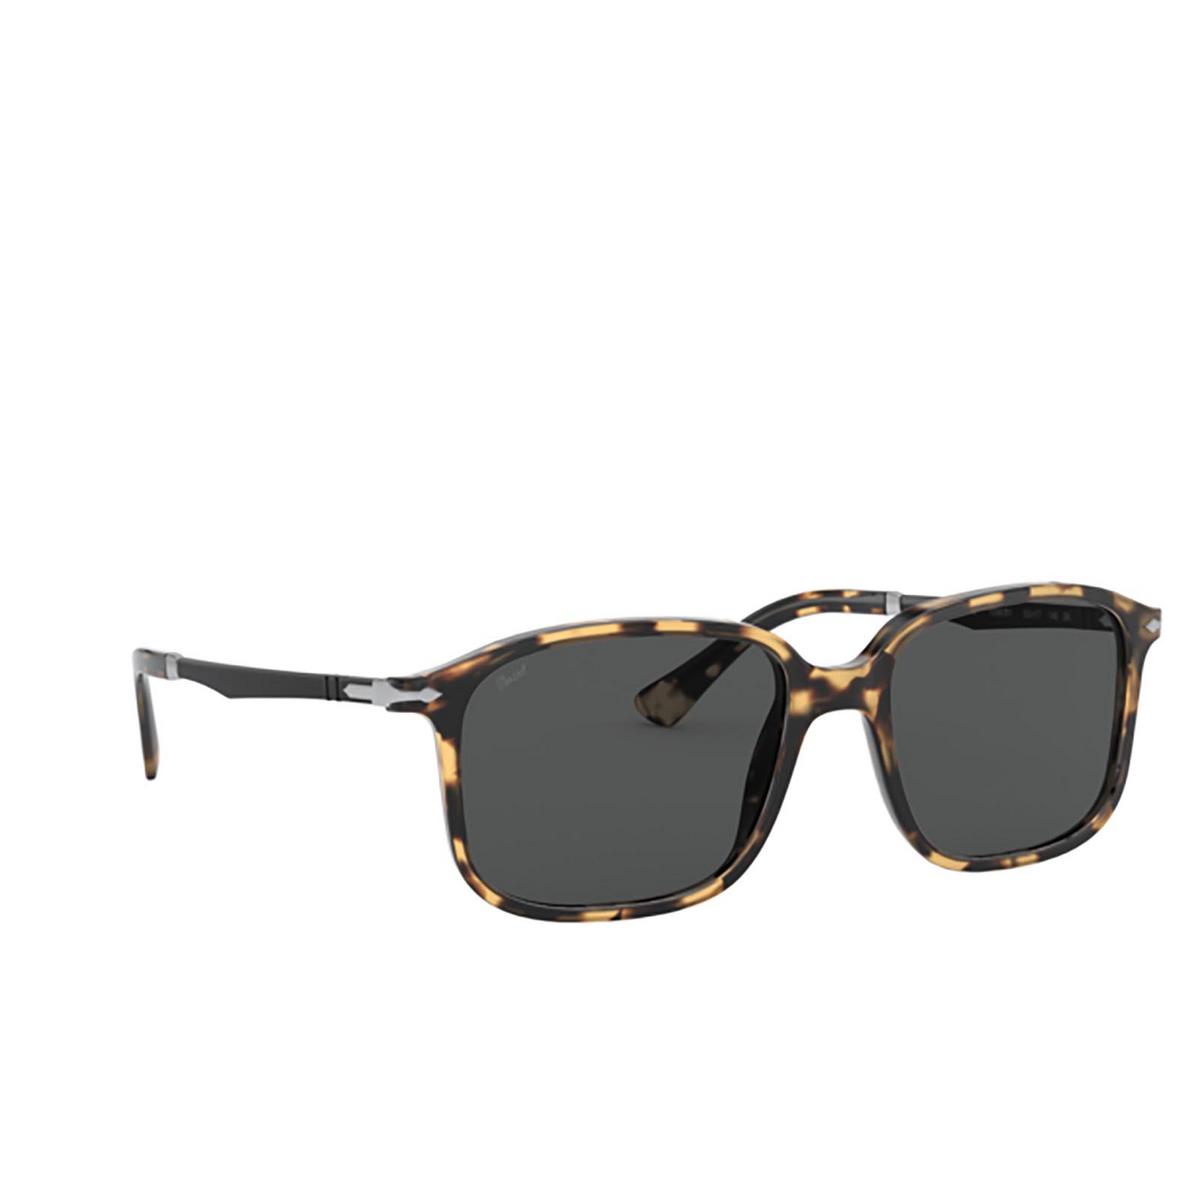 Persol® Rectangle Sunglasses: PO3246S color Brown & Beige Tortoise 1056B1 - three-quarters view.